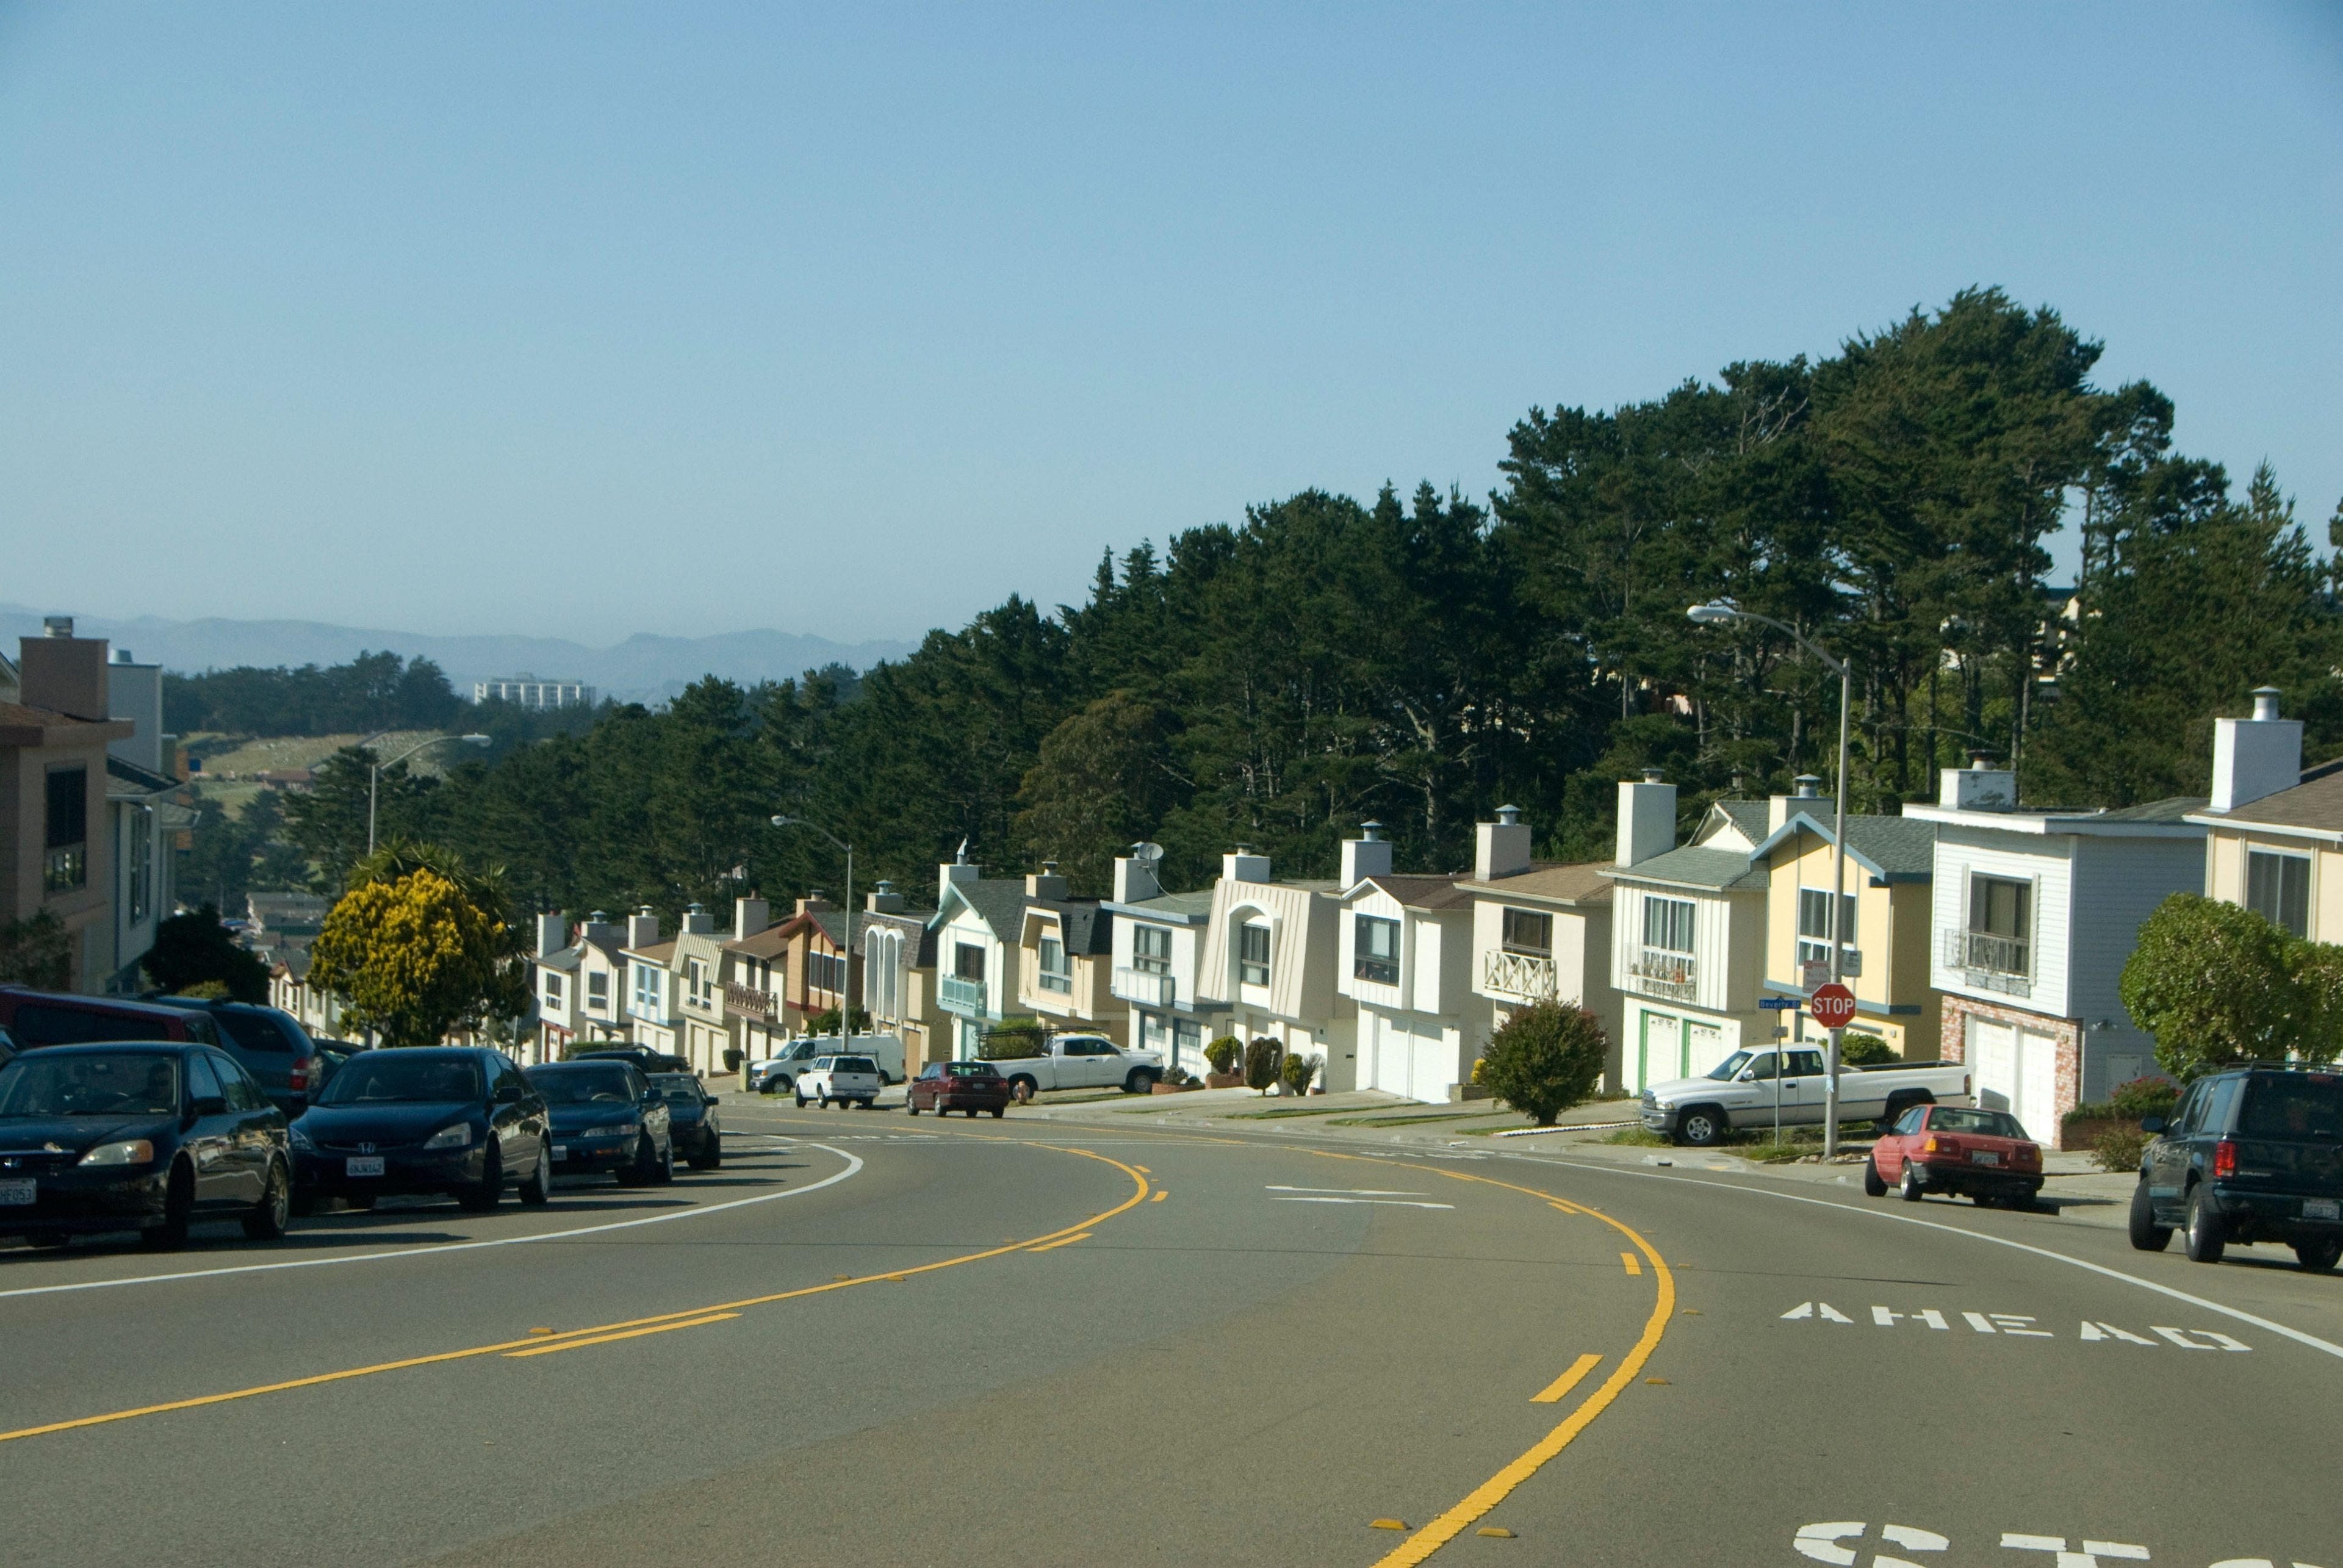 Daly City, California, United States of America